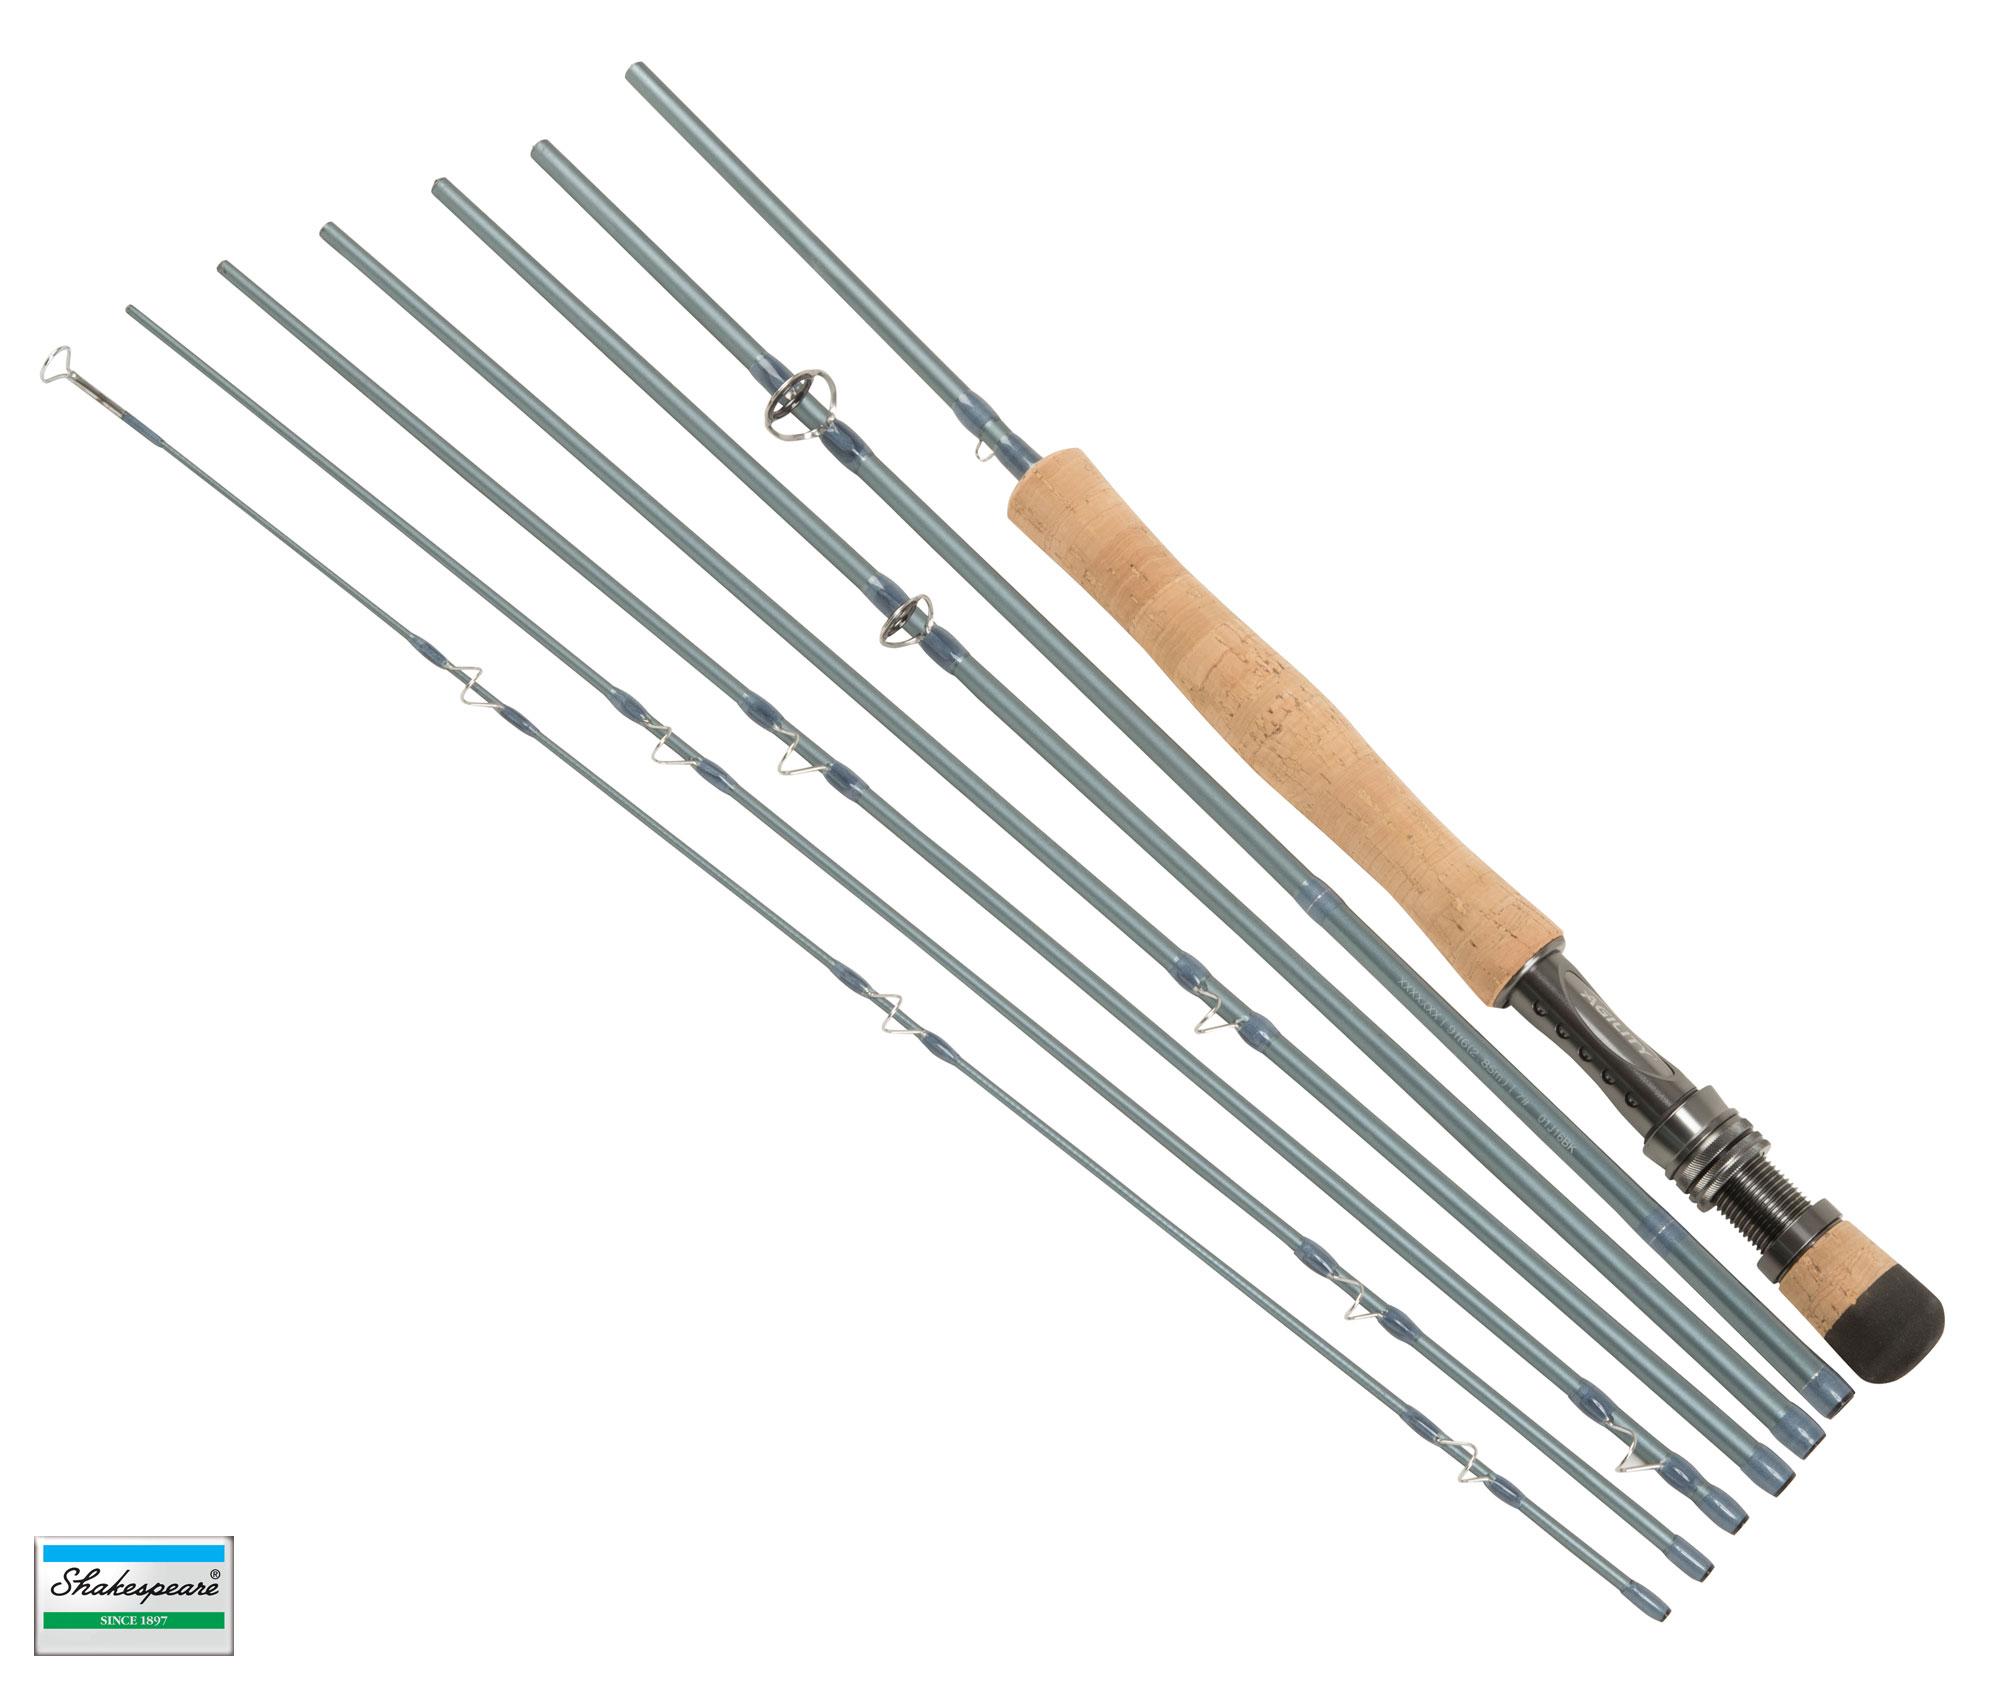 Shakespeare New Agility 2 EXP 7 Piece Travel Fly Fishing Rod Cordura Tube